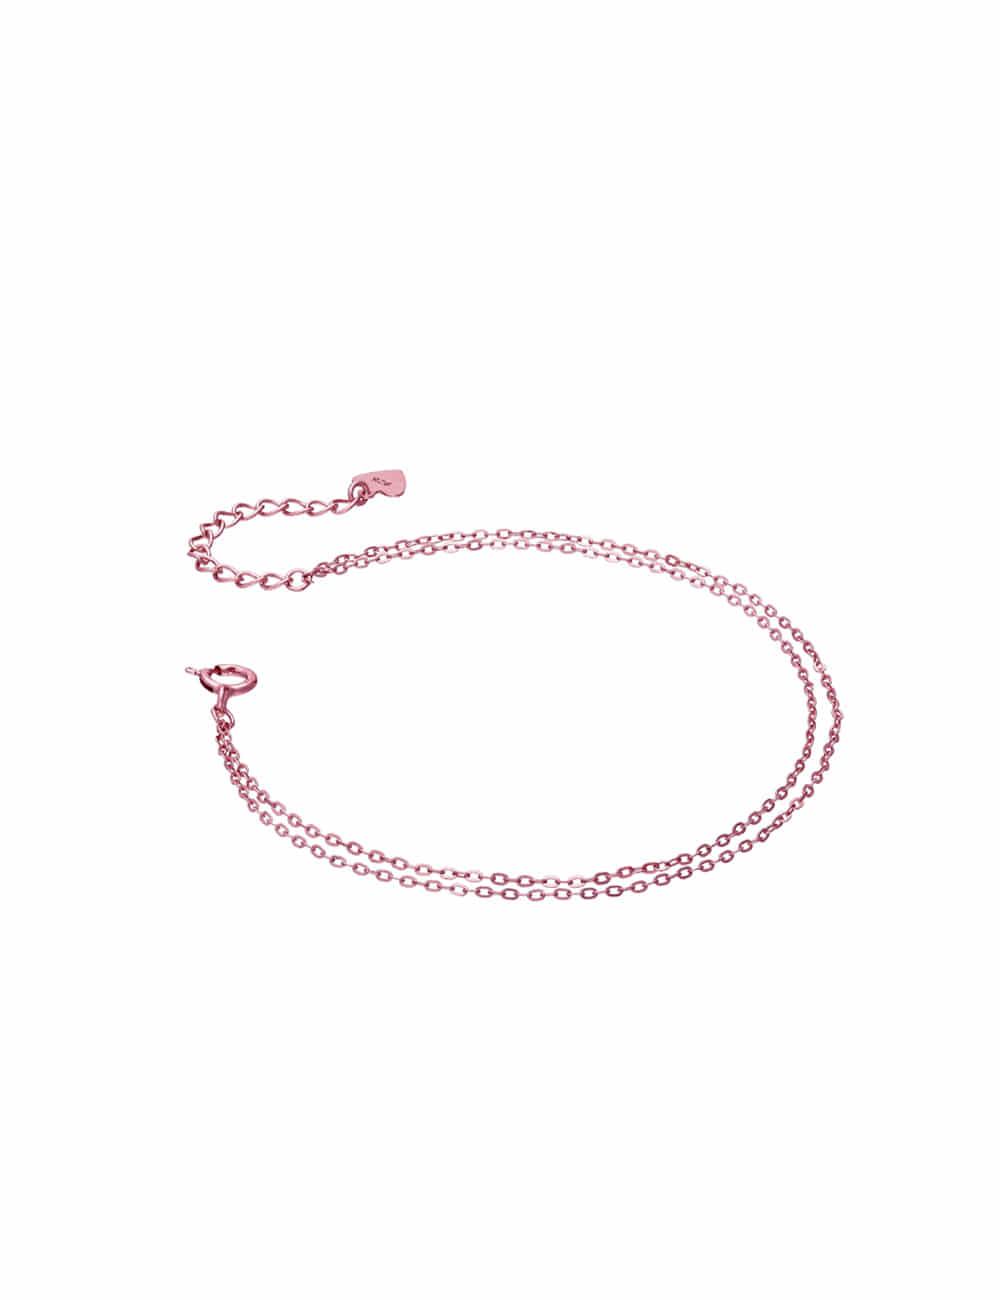 925 Silver Color Coated Layered Bracelet _ 블랙 핑크 브라운 레이어드팔찌 라비쉬에